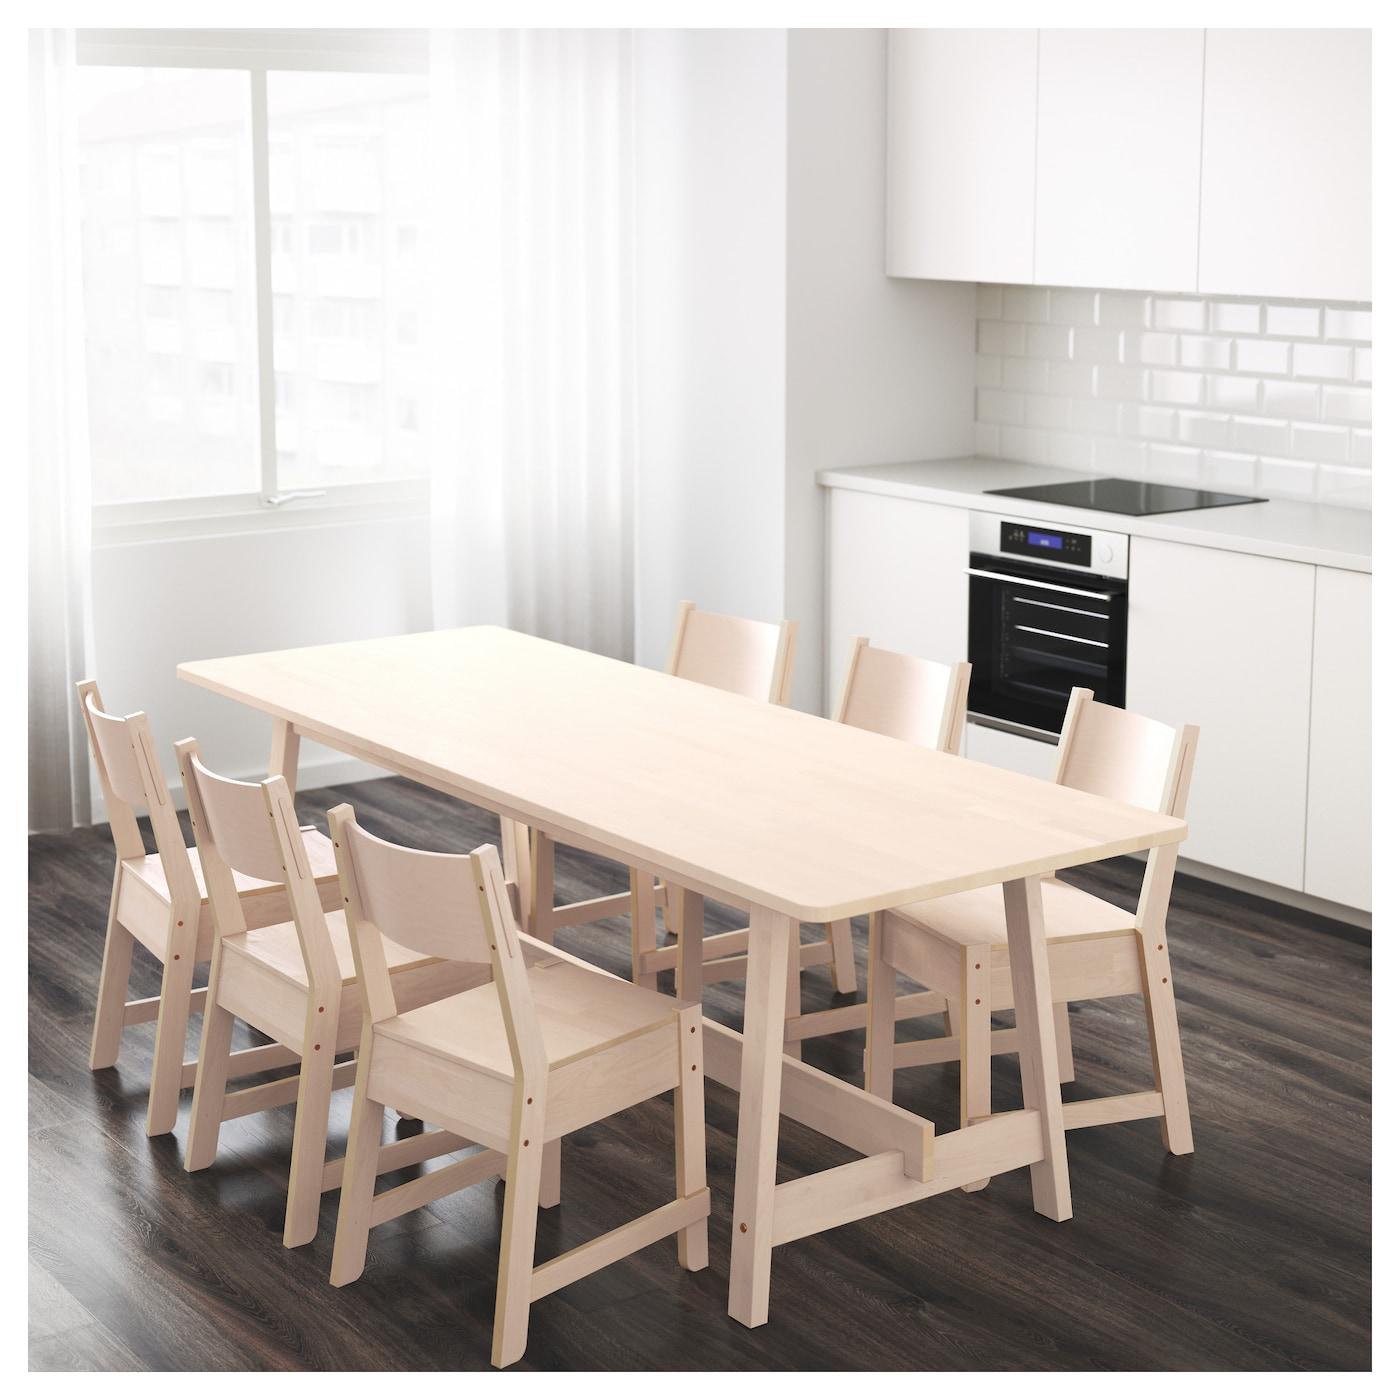 NORRÅKER Table White Birch 220 X 80 Cm